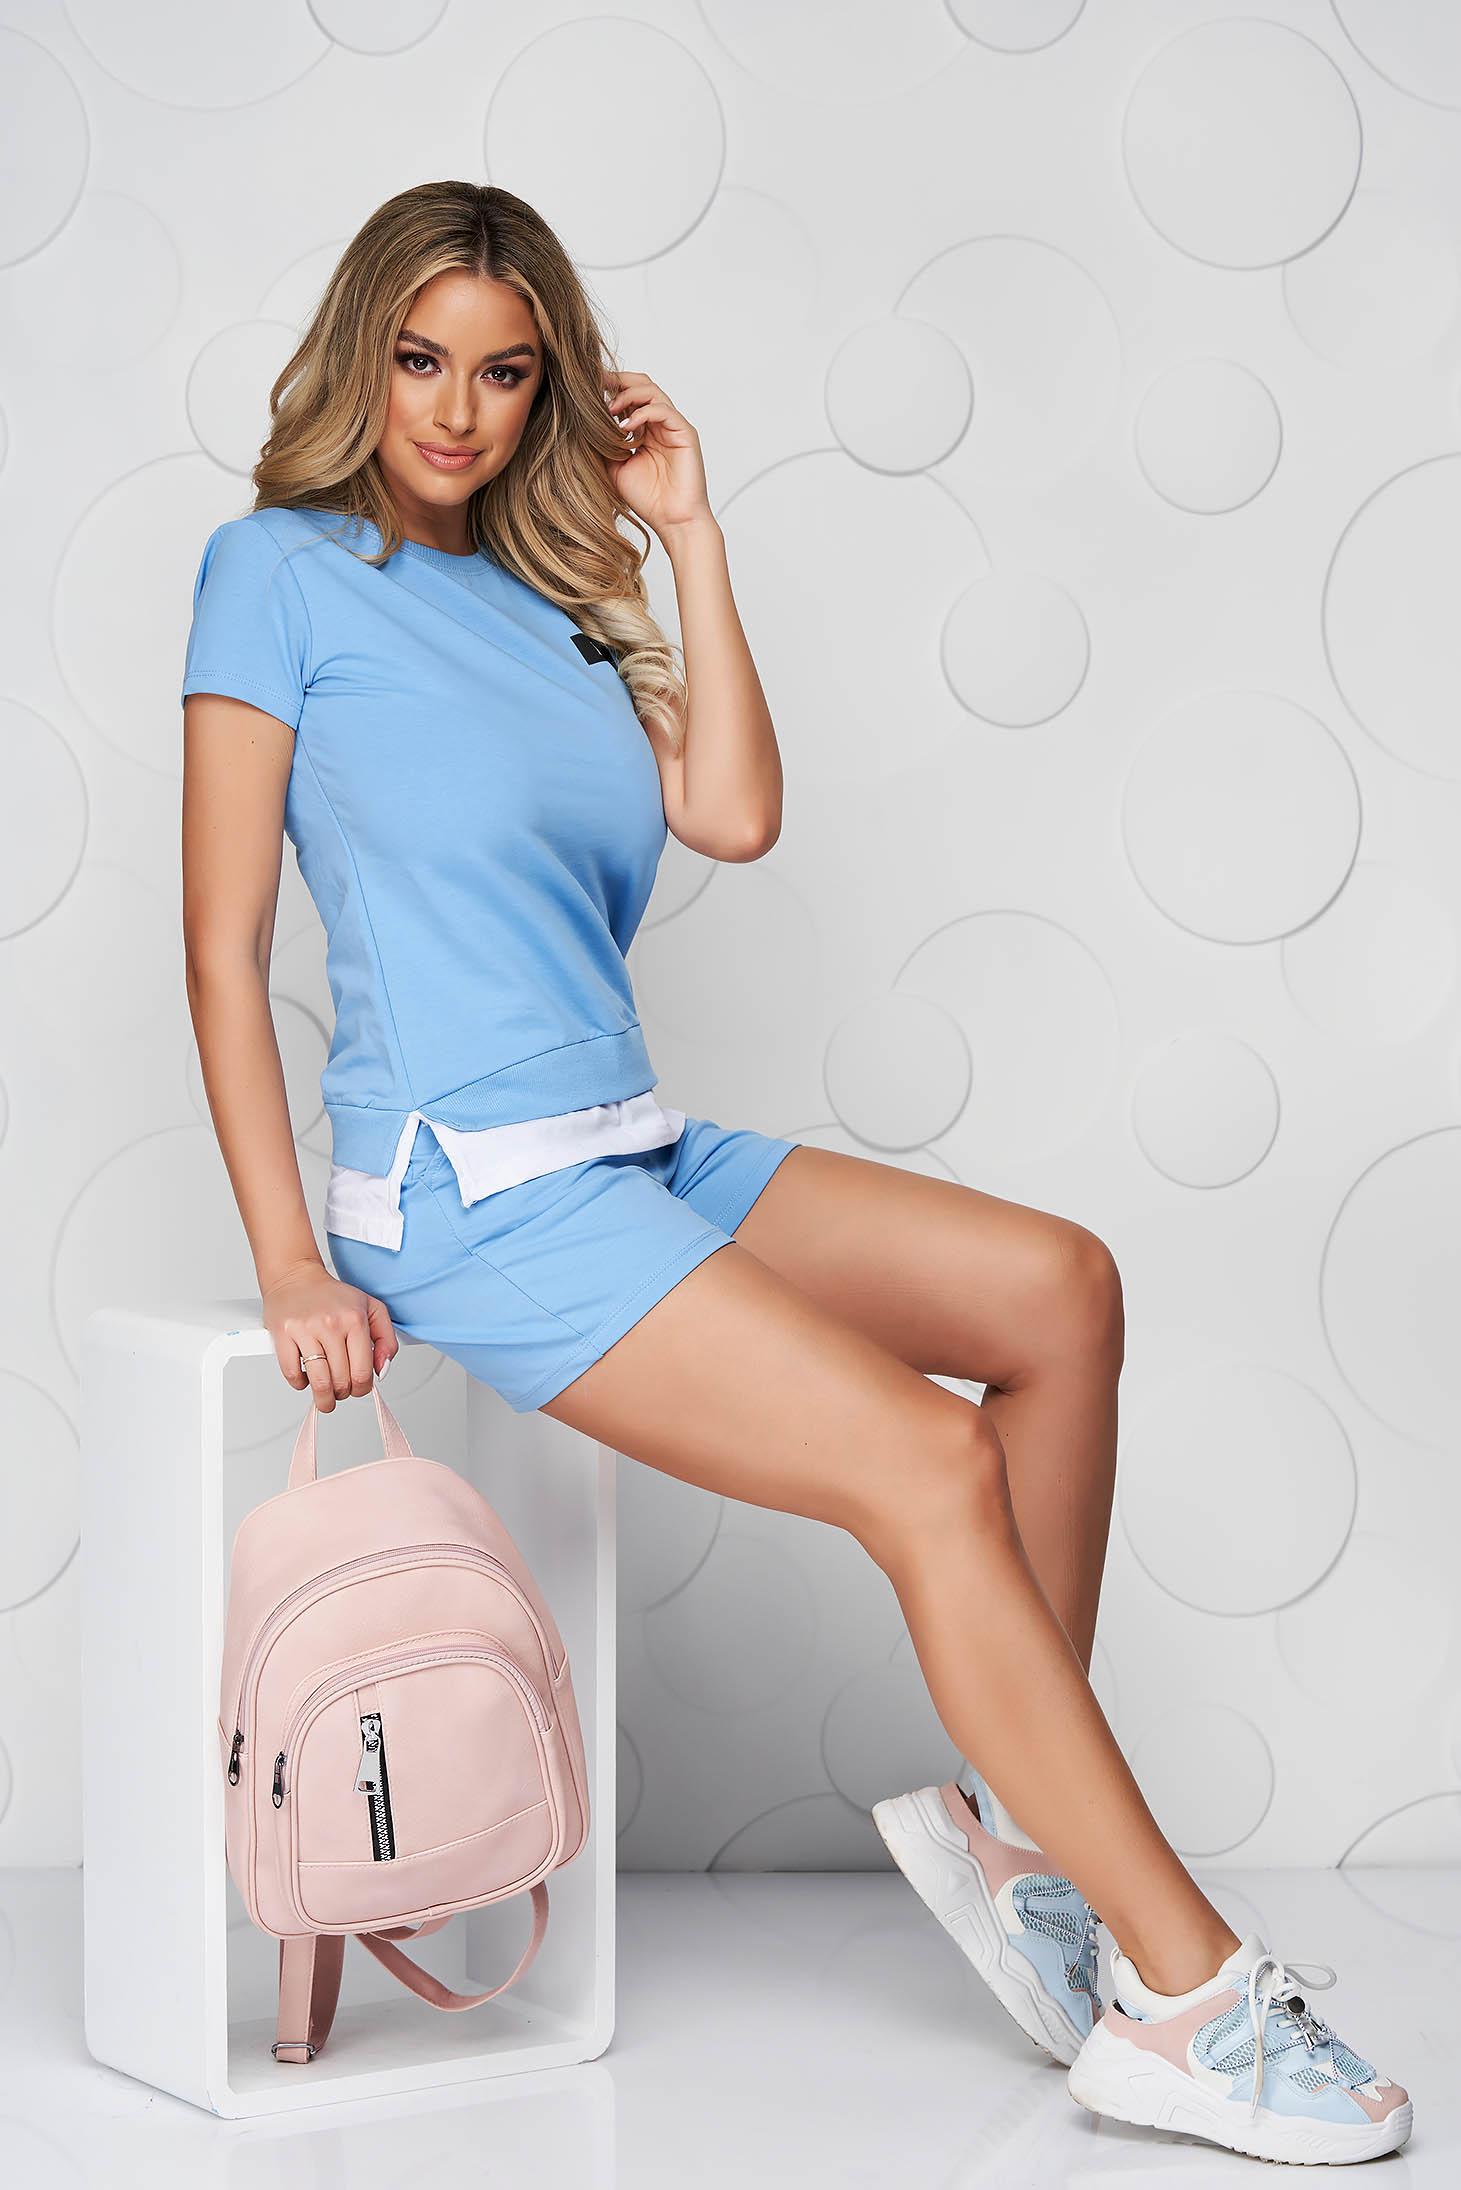 Lightblue sport 2 pieces cotton women`s shorts women`s t-shirt